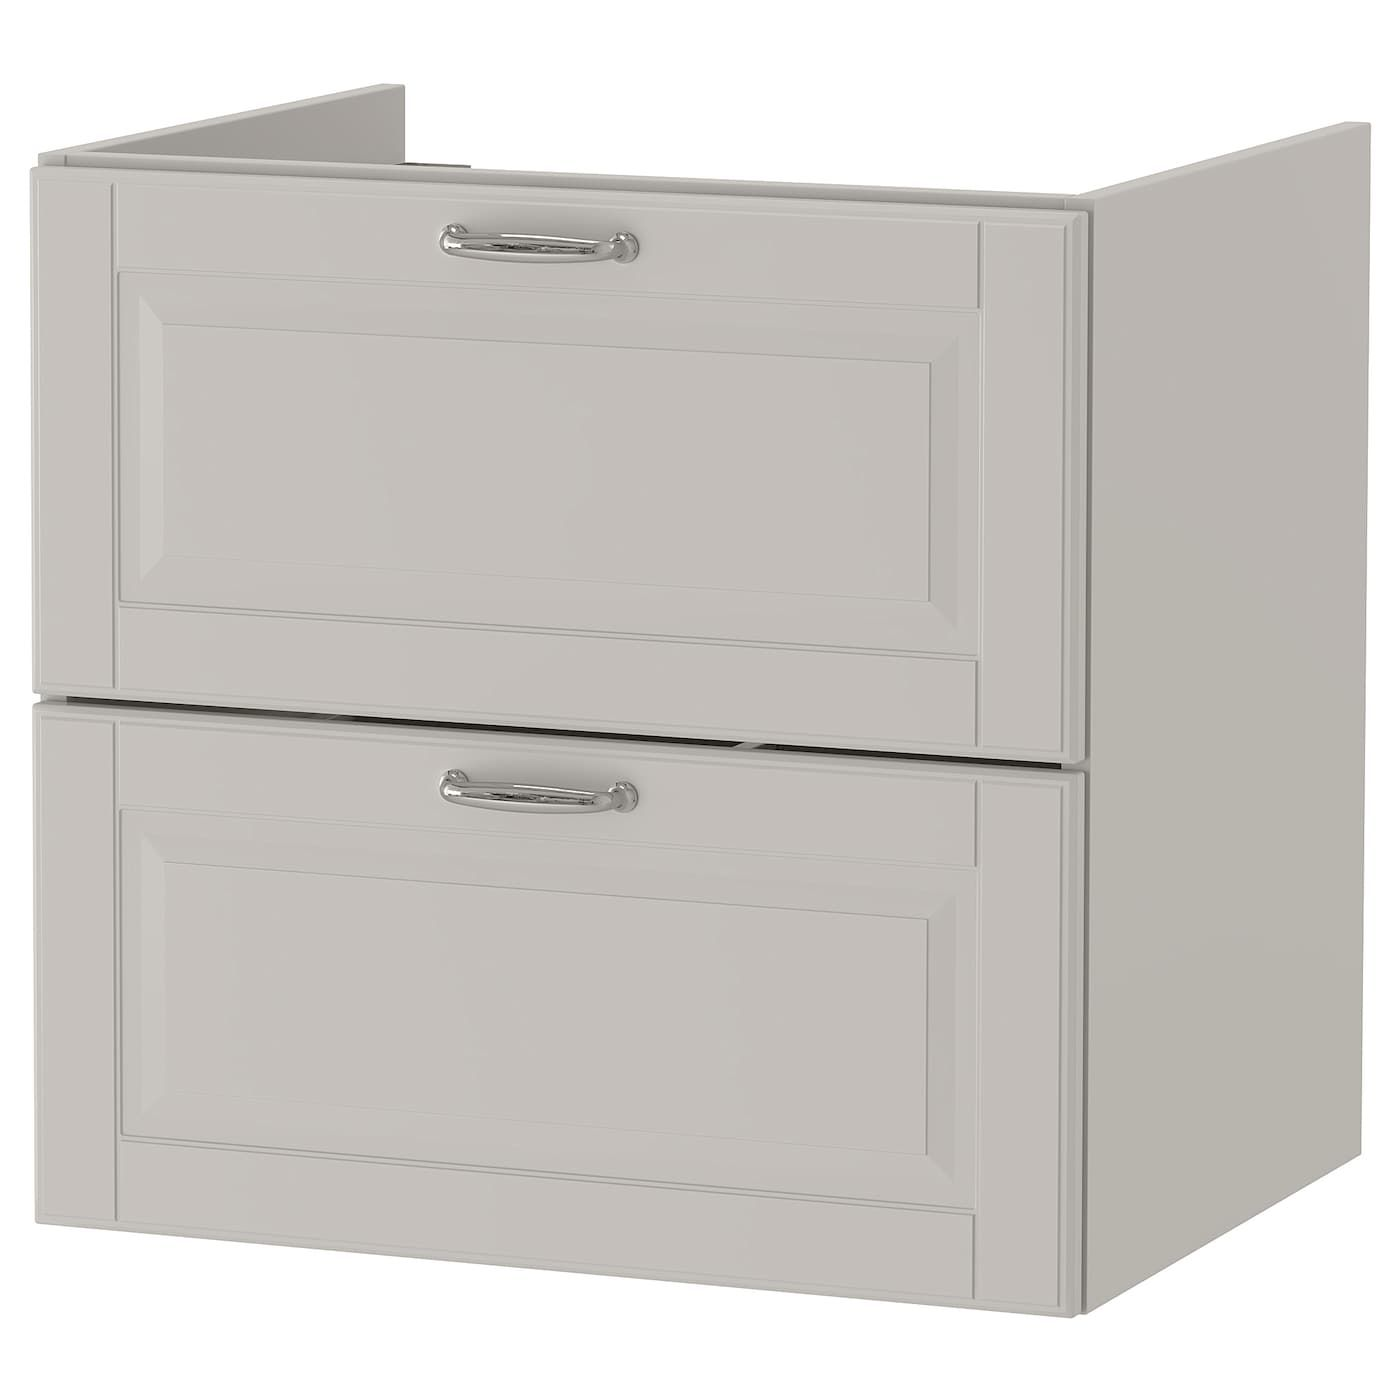 Godmorgon Bathroom Vanity Kasjon Light Gray Ikea For 1 2 Bath Possibly Lmb In 2020 Sink Cabinet Ikea Ikea Godmorgon